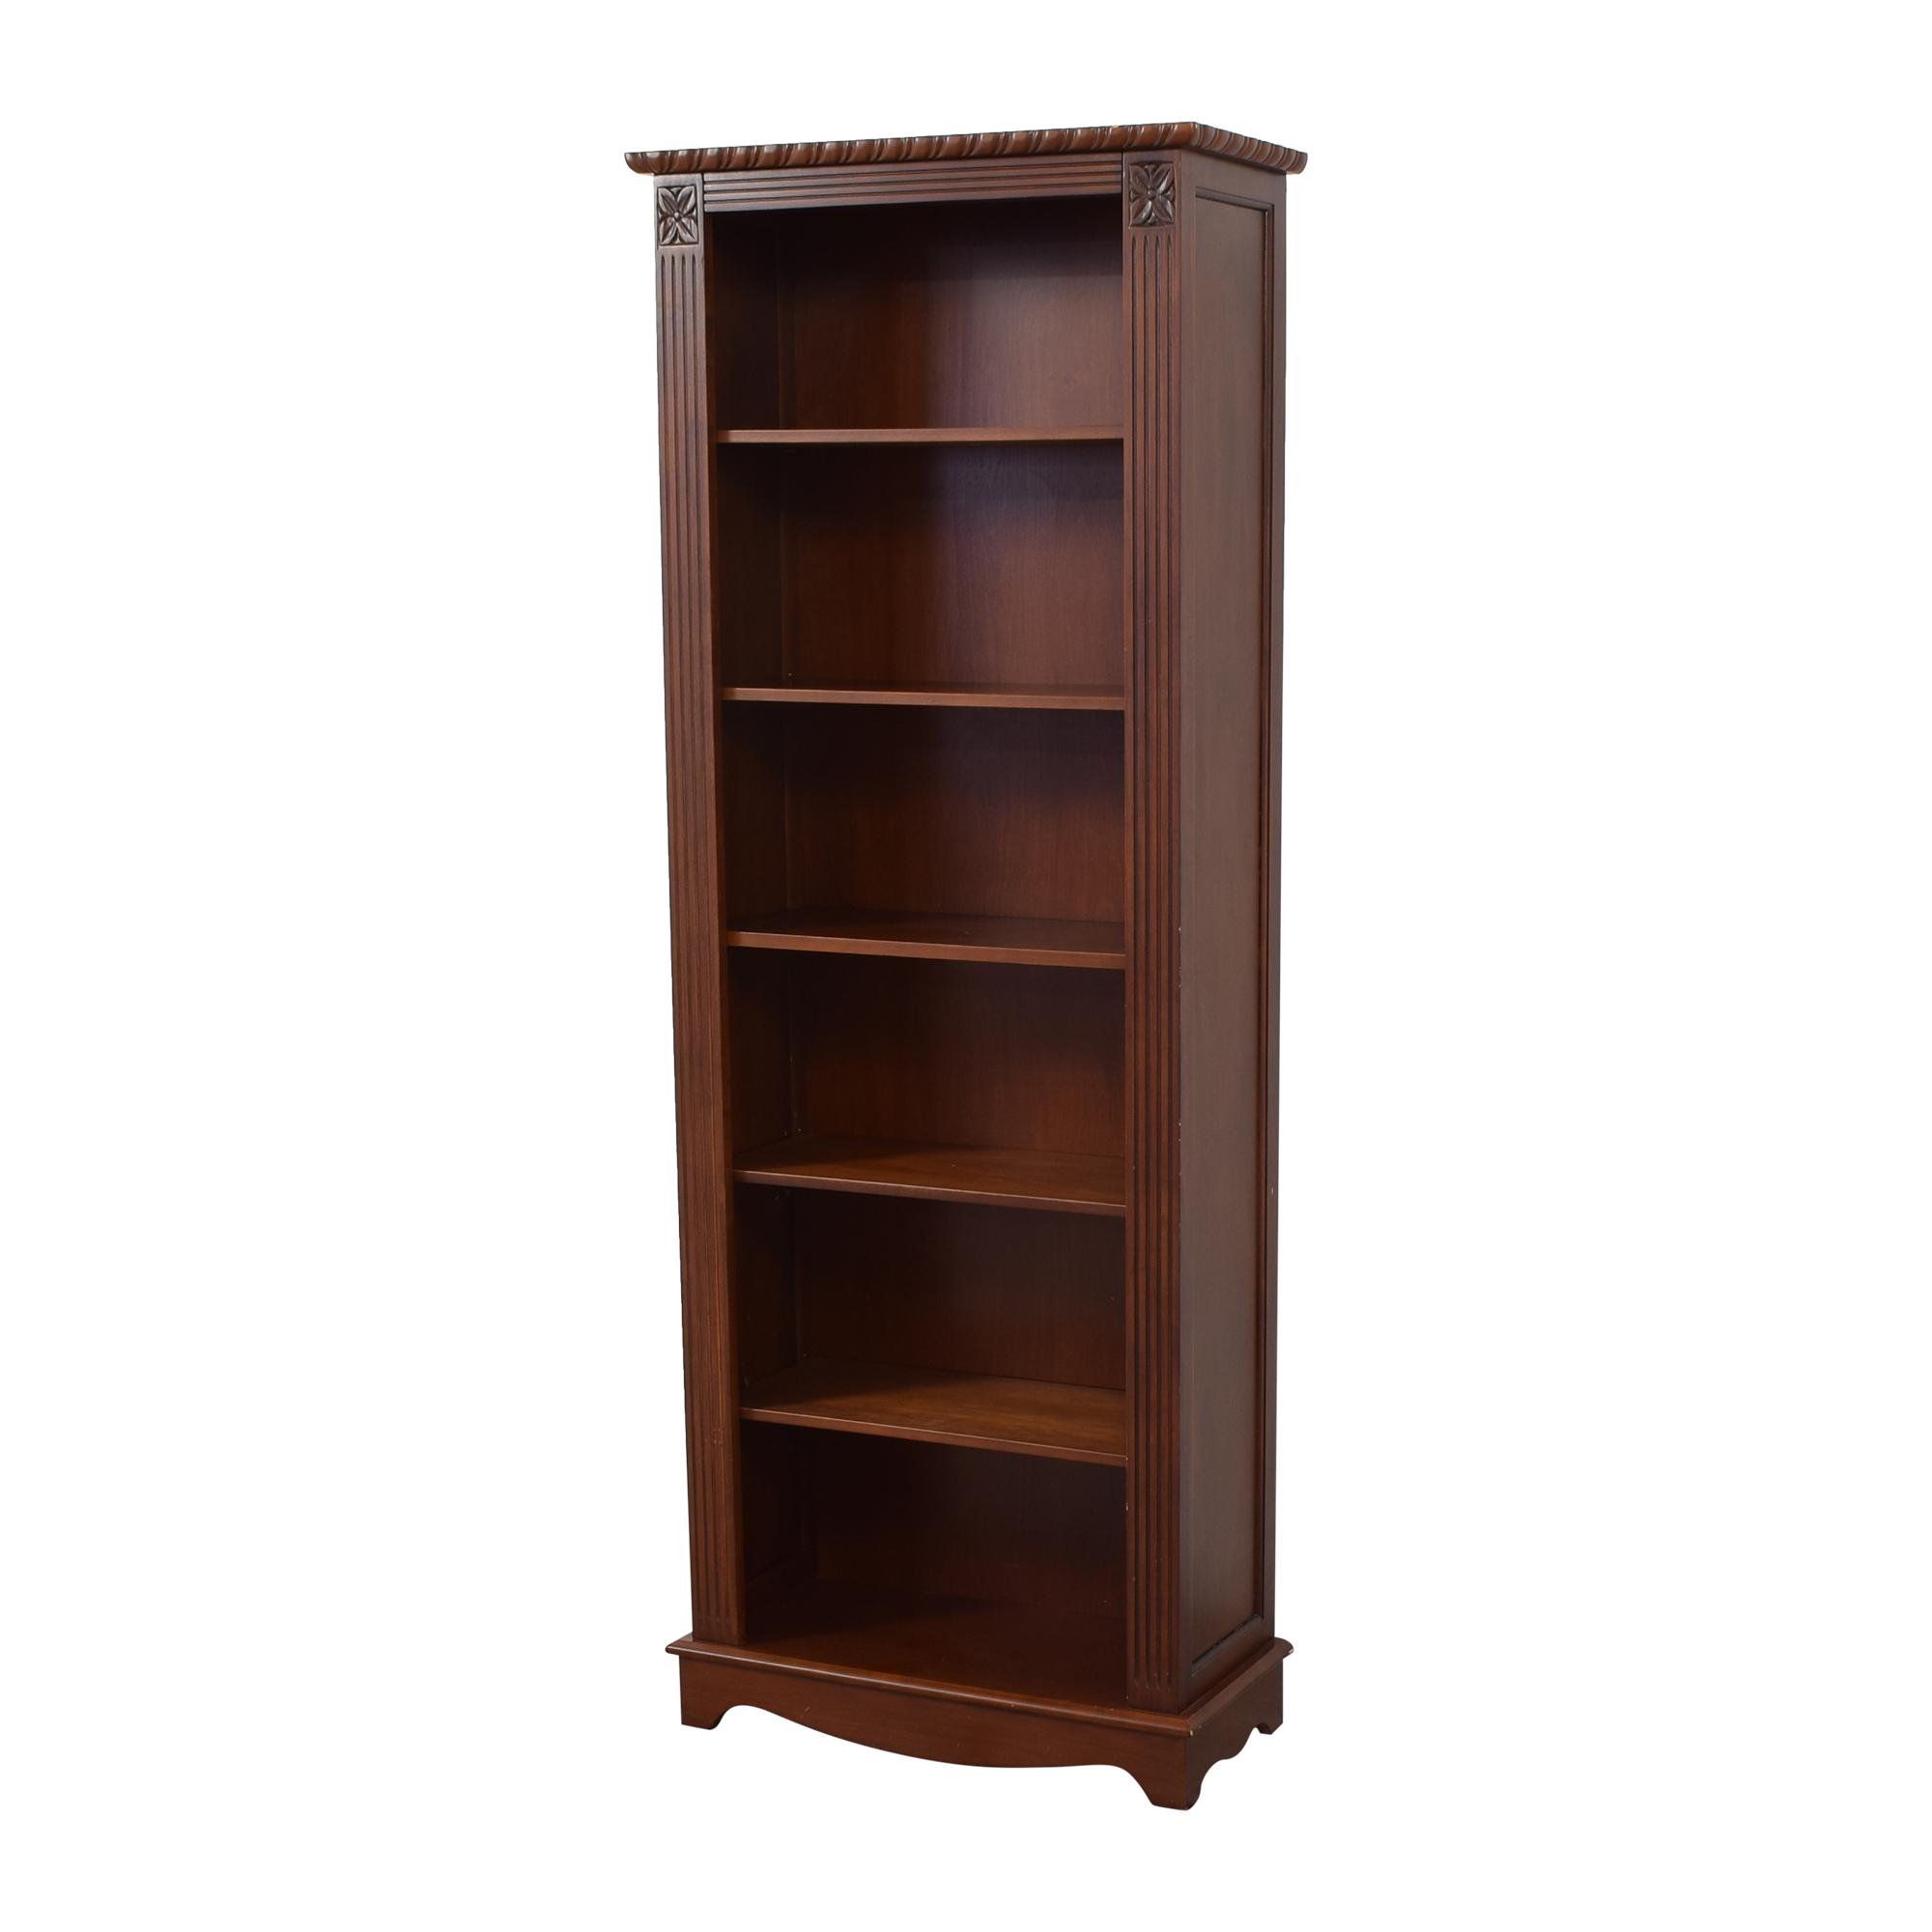 Tall Six Shelf Bookcase / Bookcases & Shelving